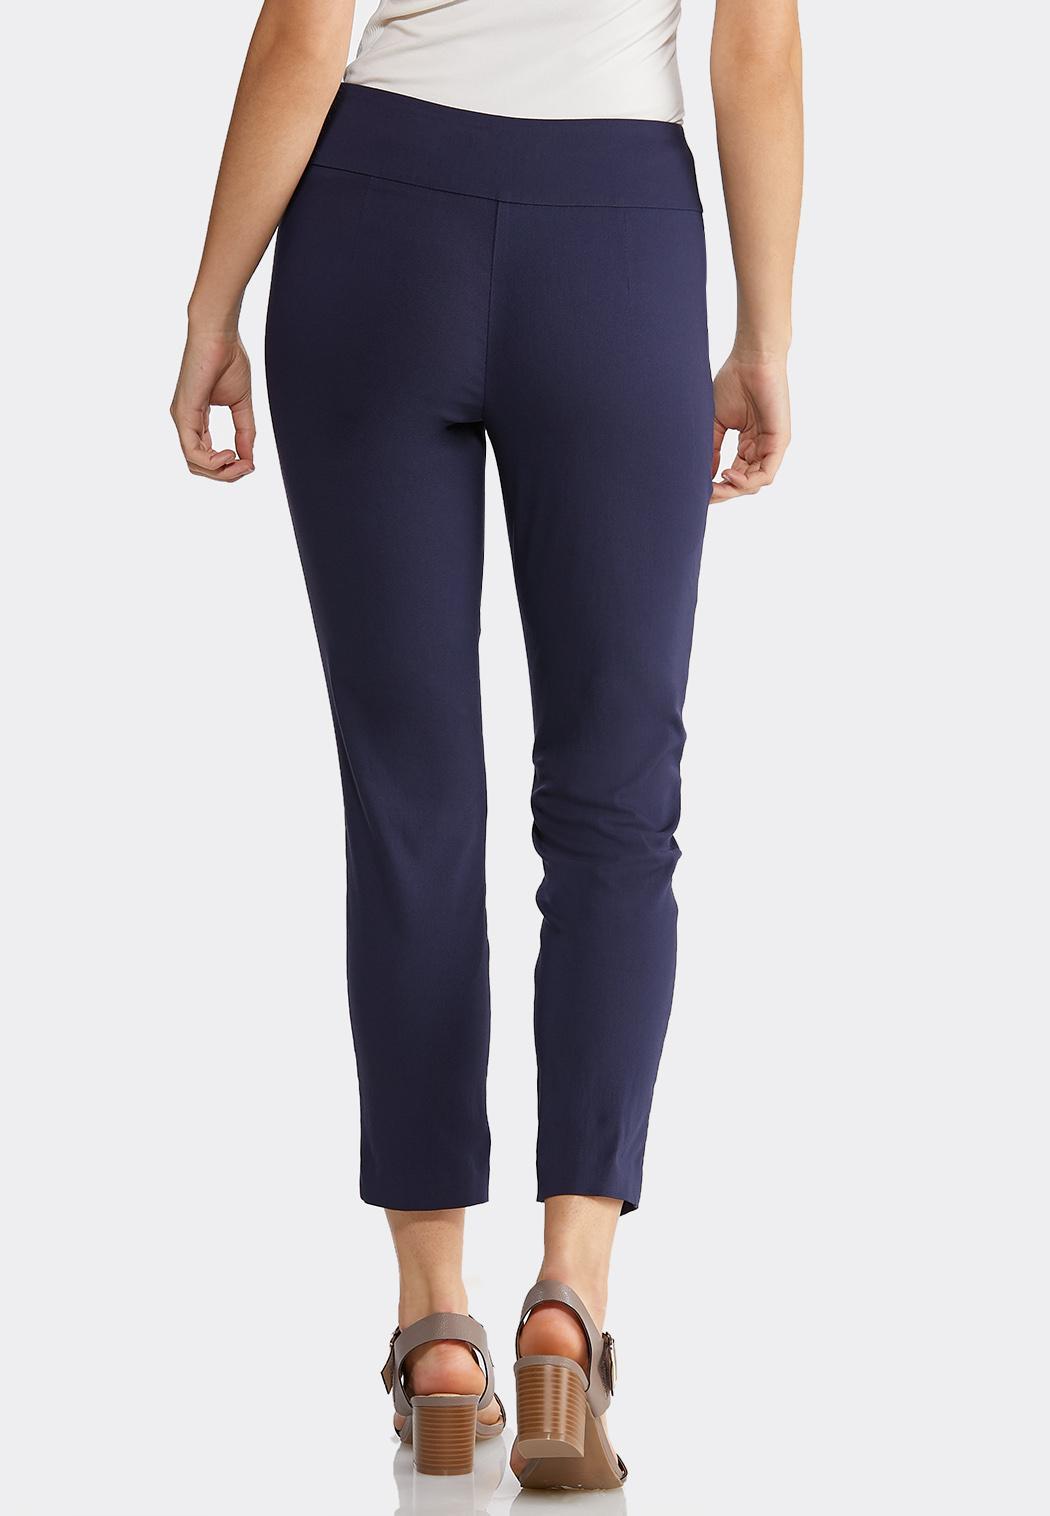 Twill Slim Ankle Pants (Item #43927140)